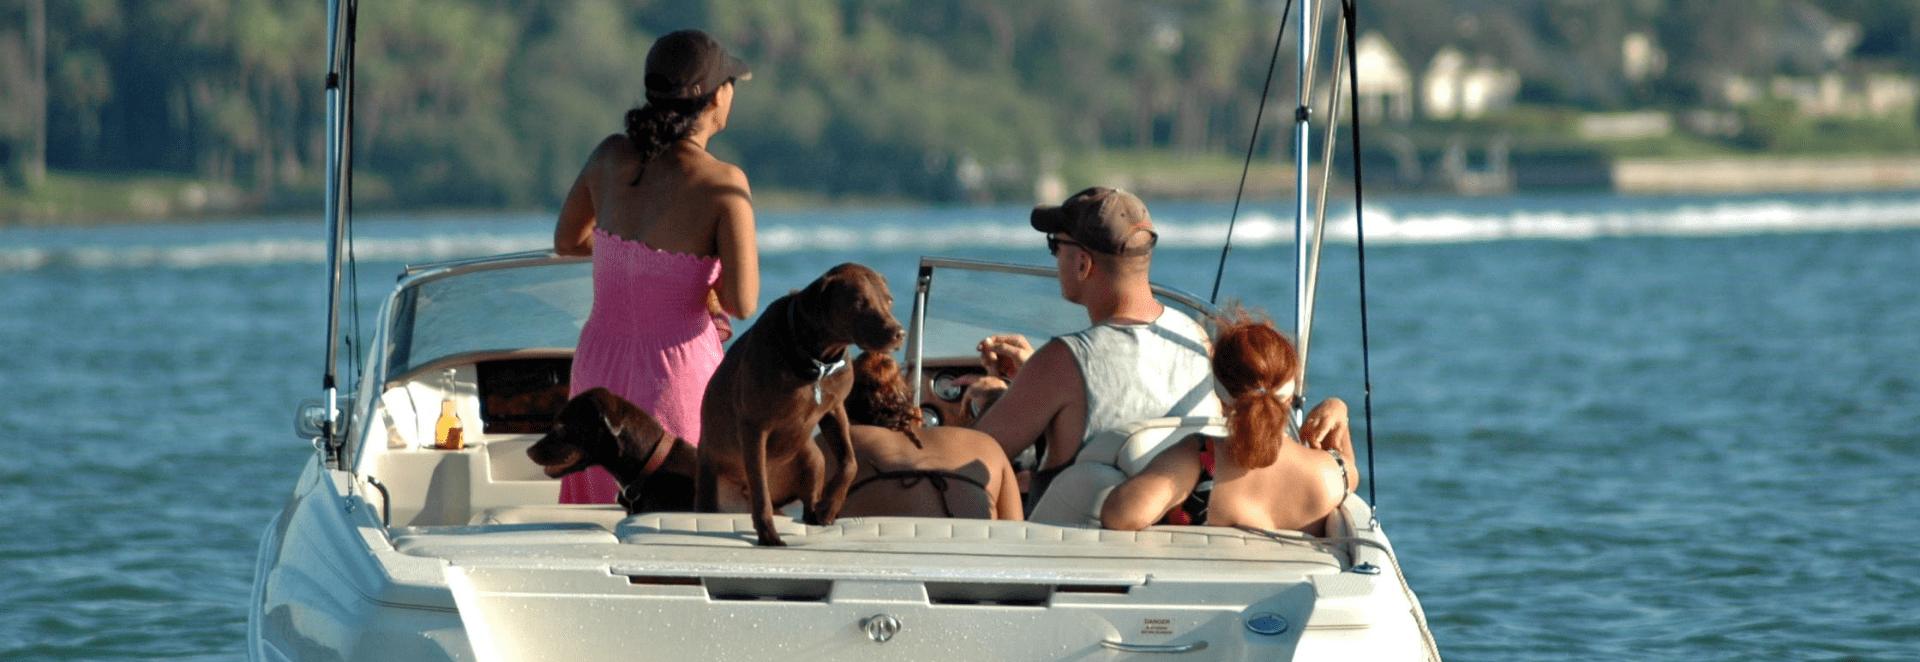 Keep On Boating